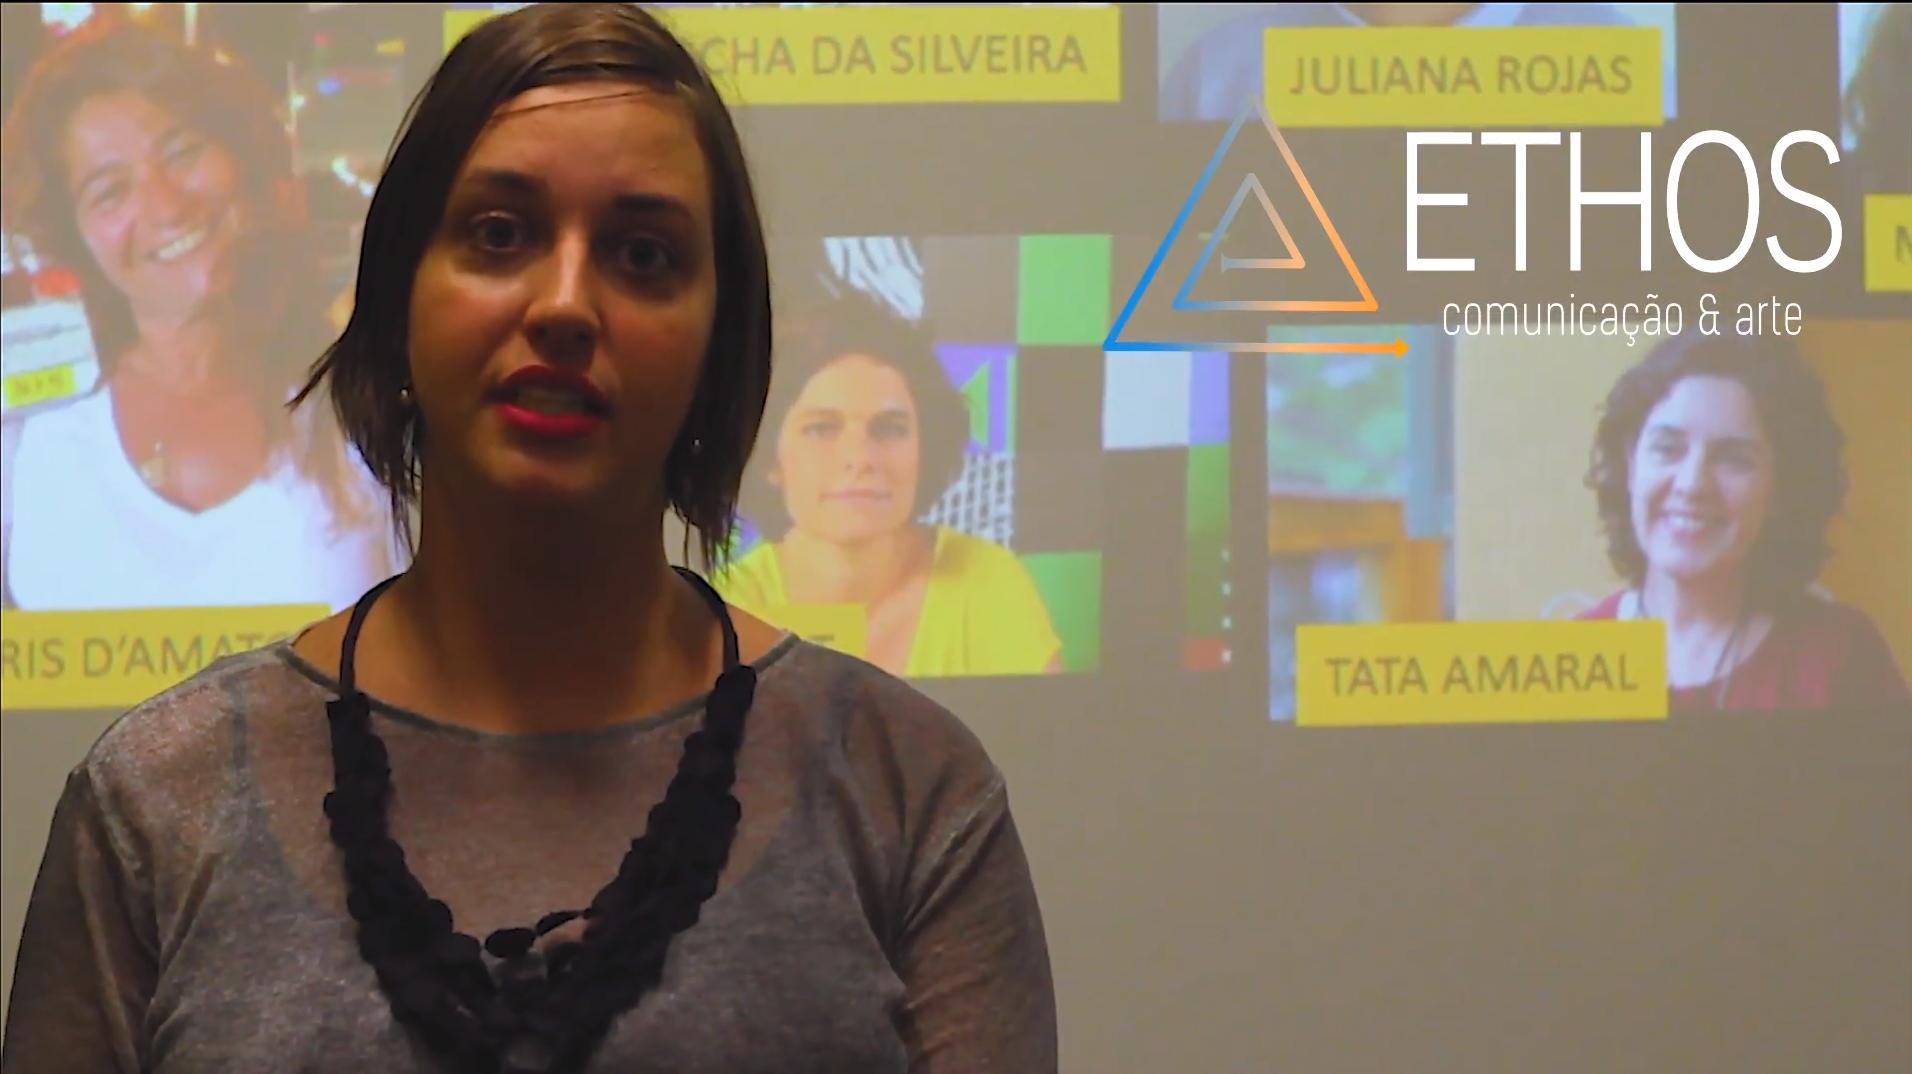 Barbara Sturm – A Mulher No Mercado Audiovisual